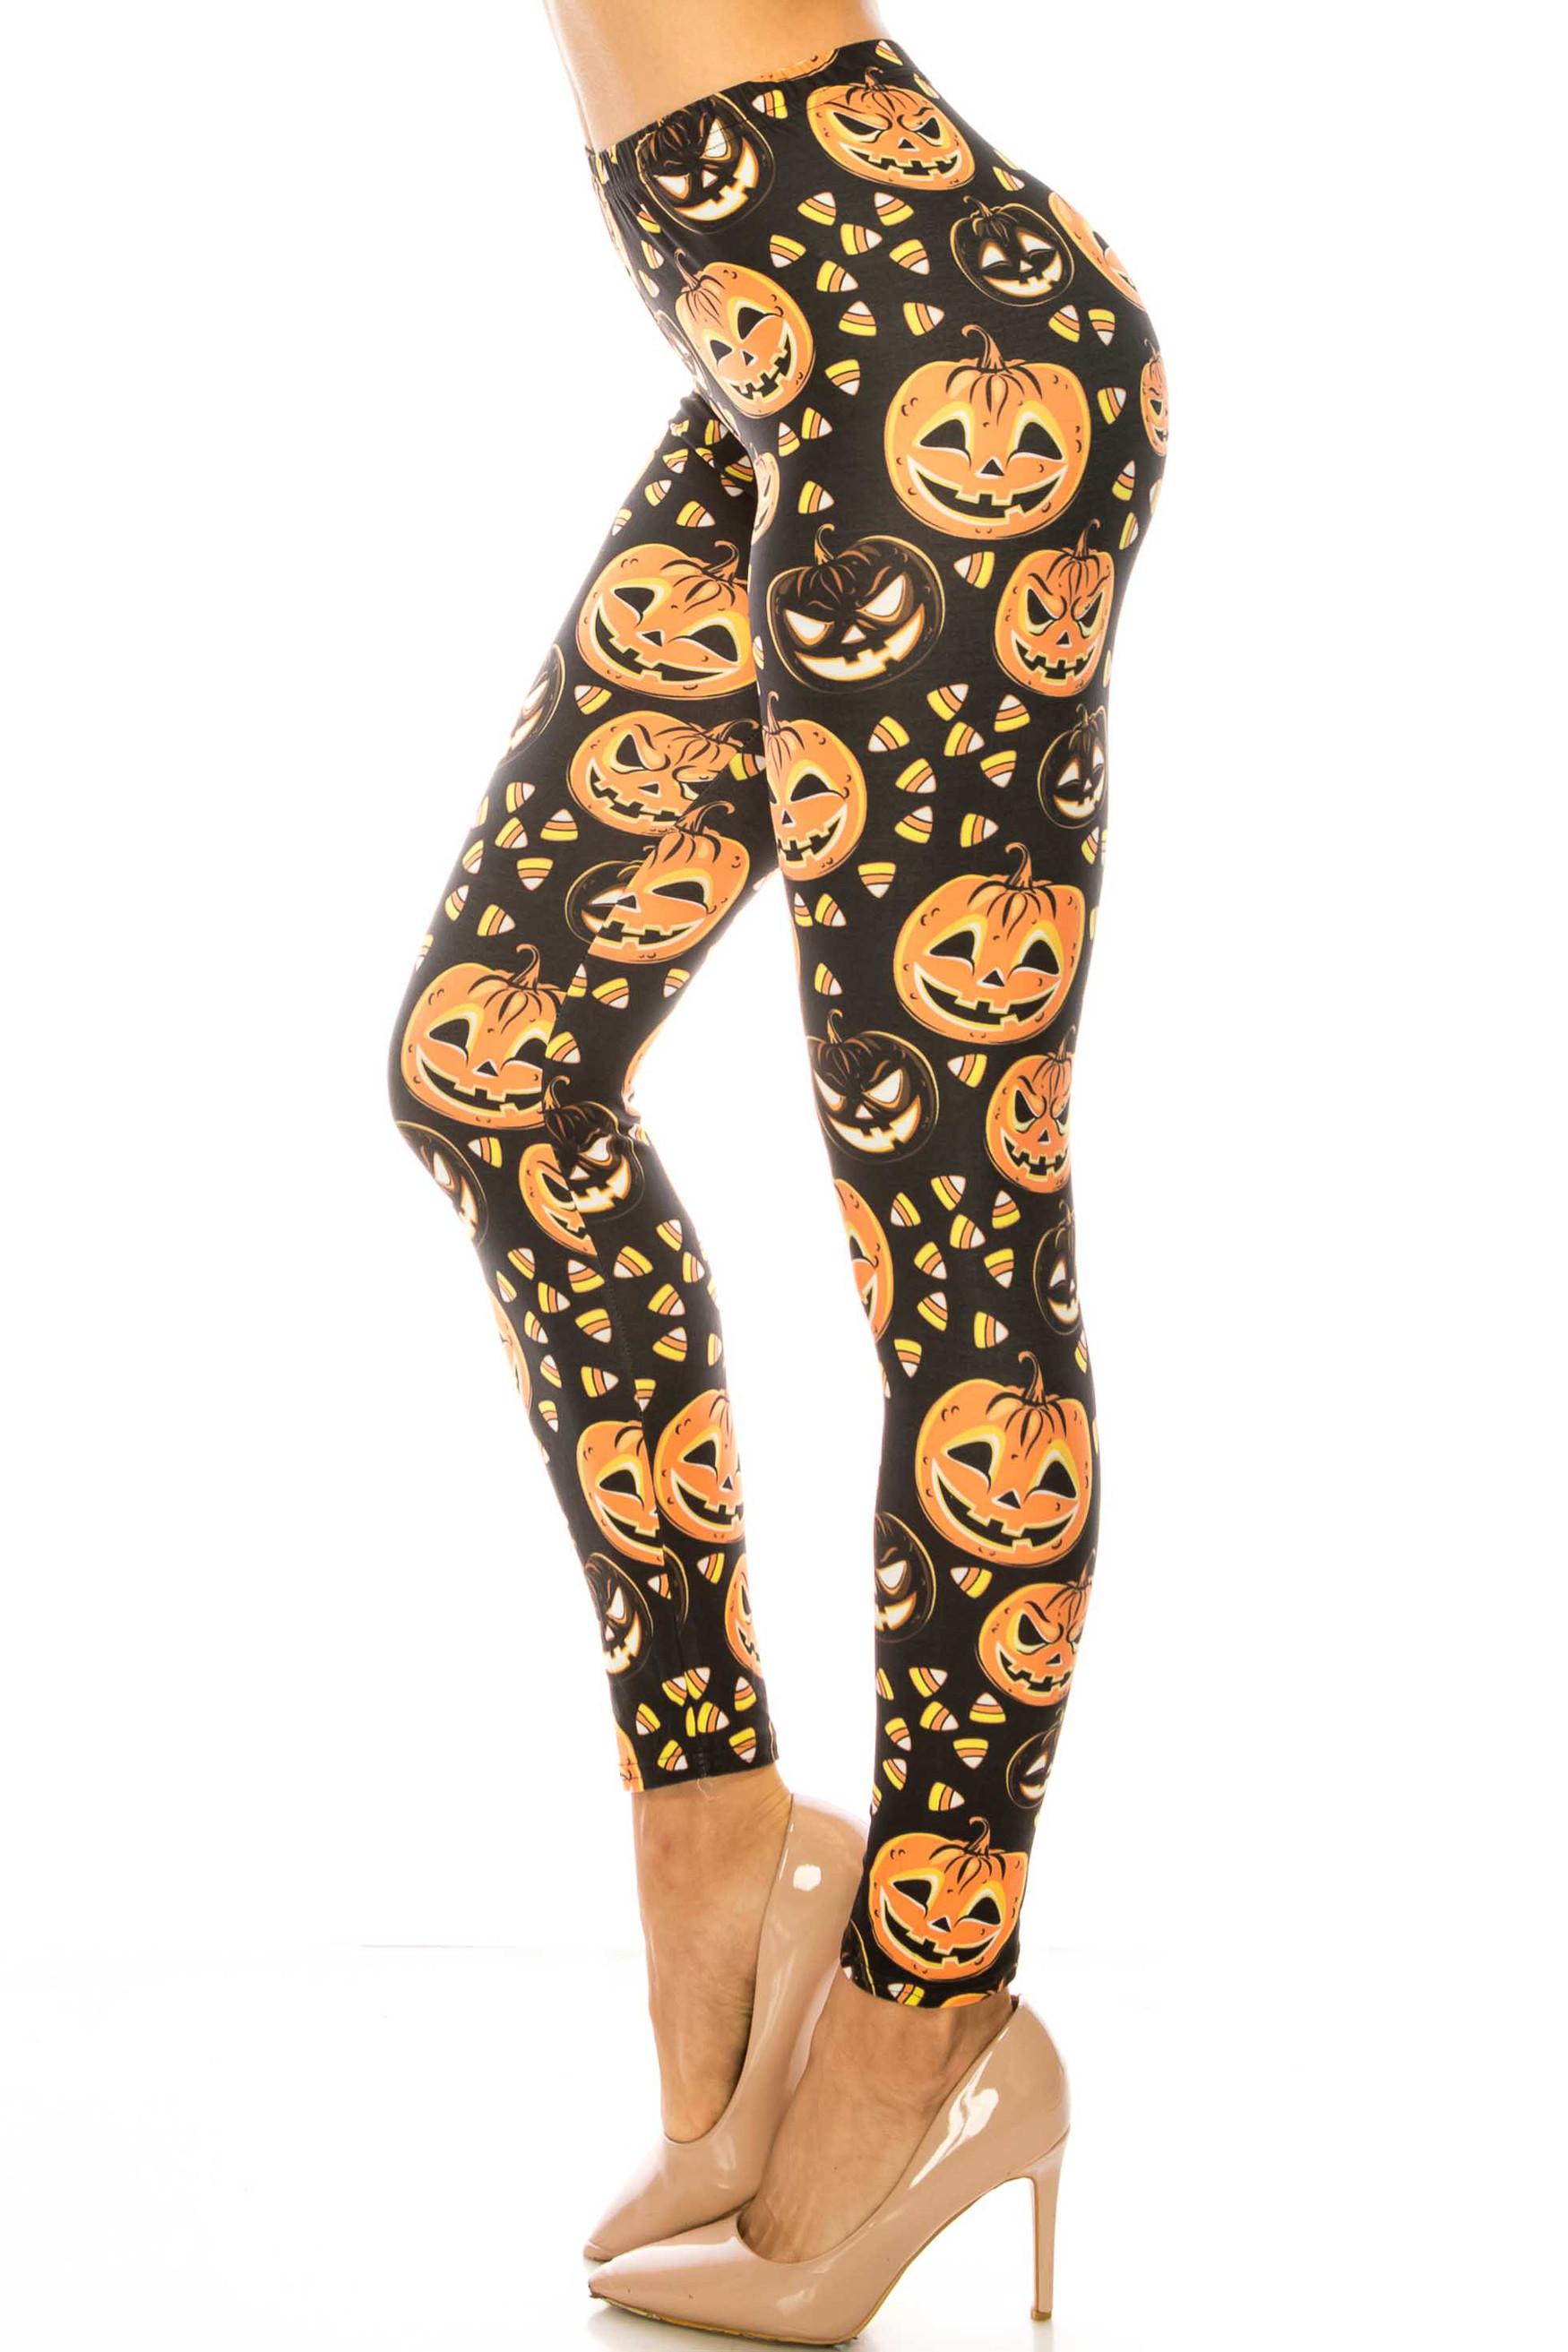 Creamy Soft Halloween Pumpkins Kids Leggings - USA Fashion™